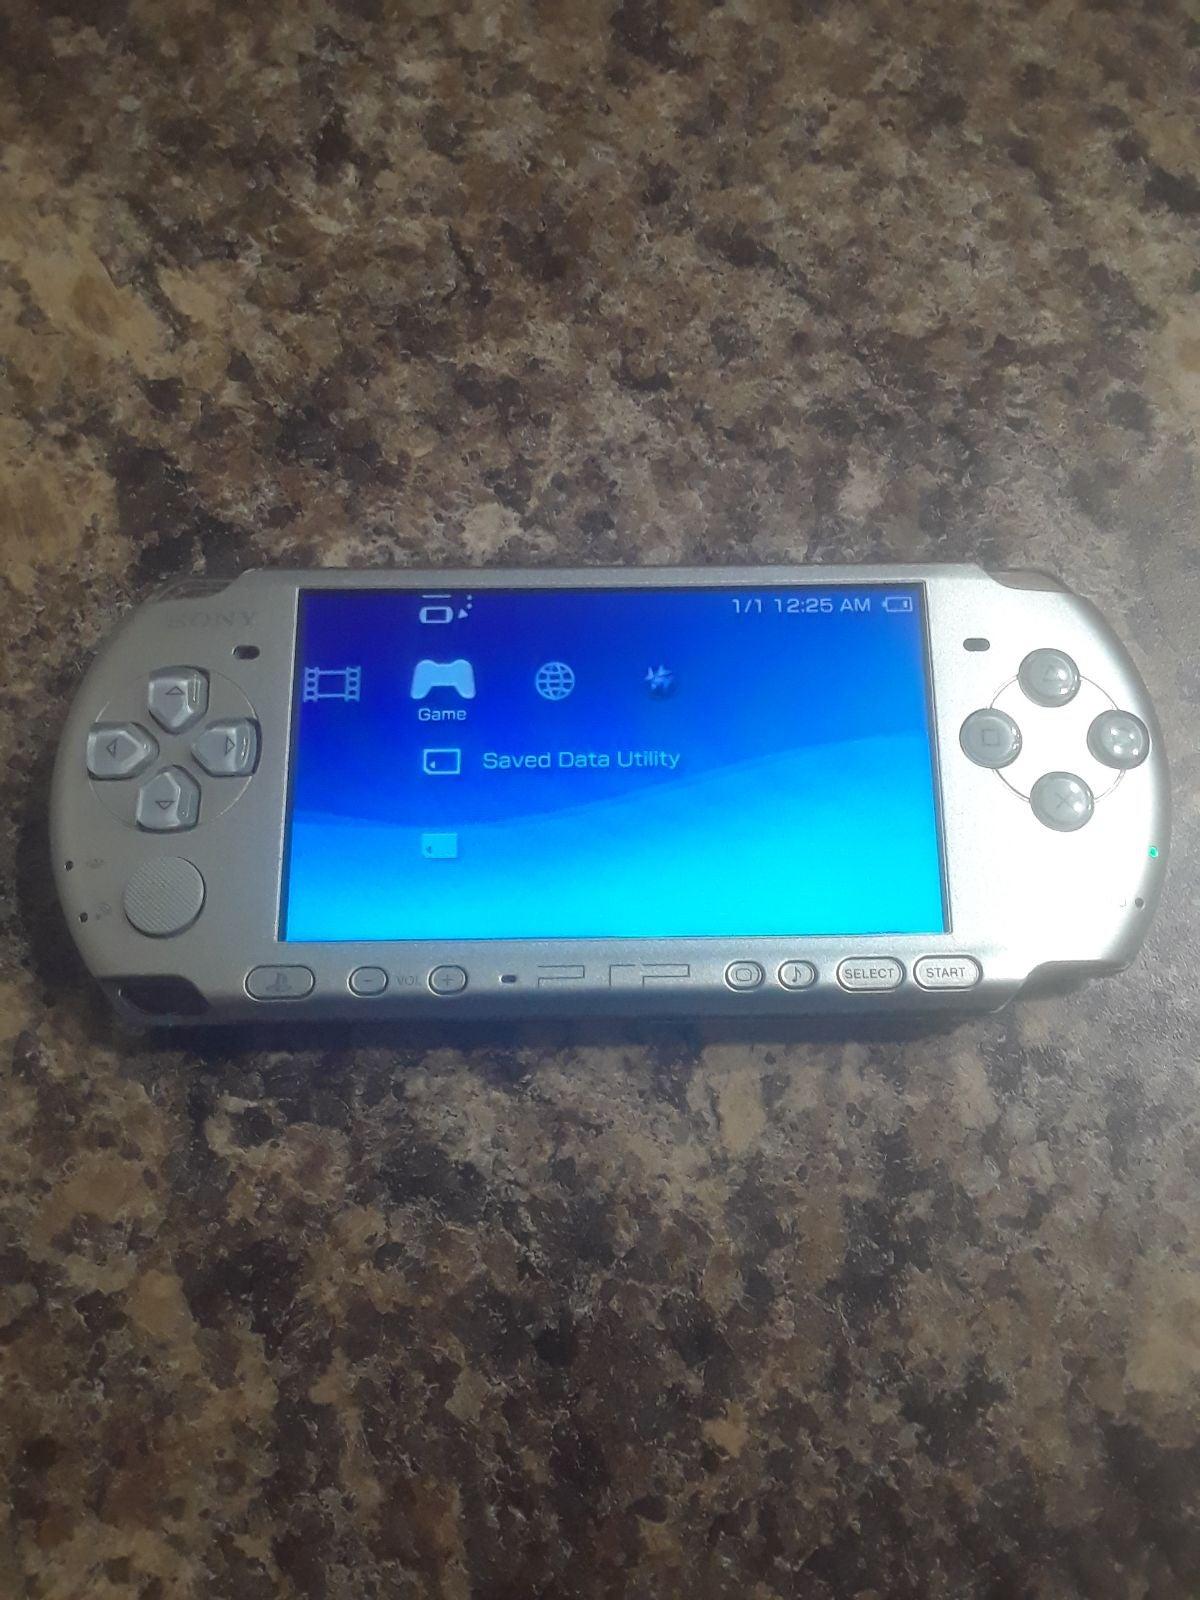 Sony PSP Game